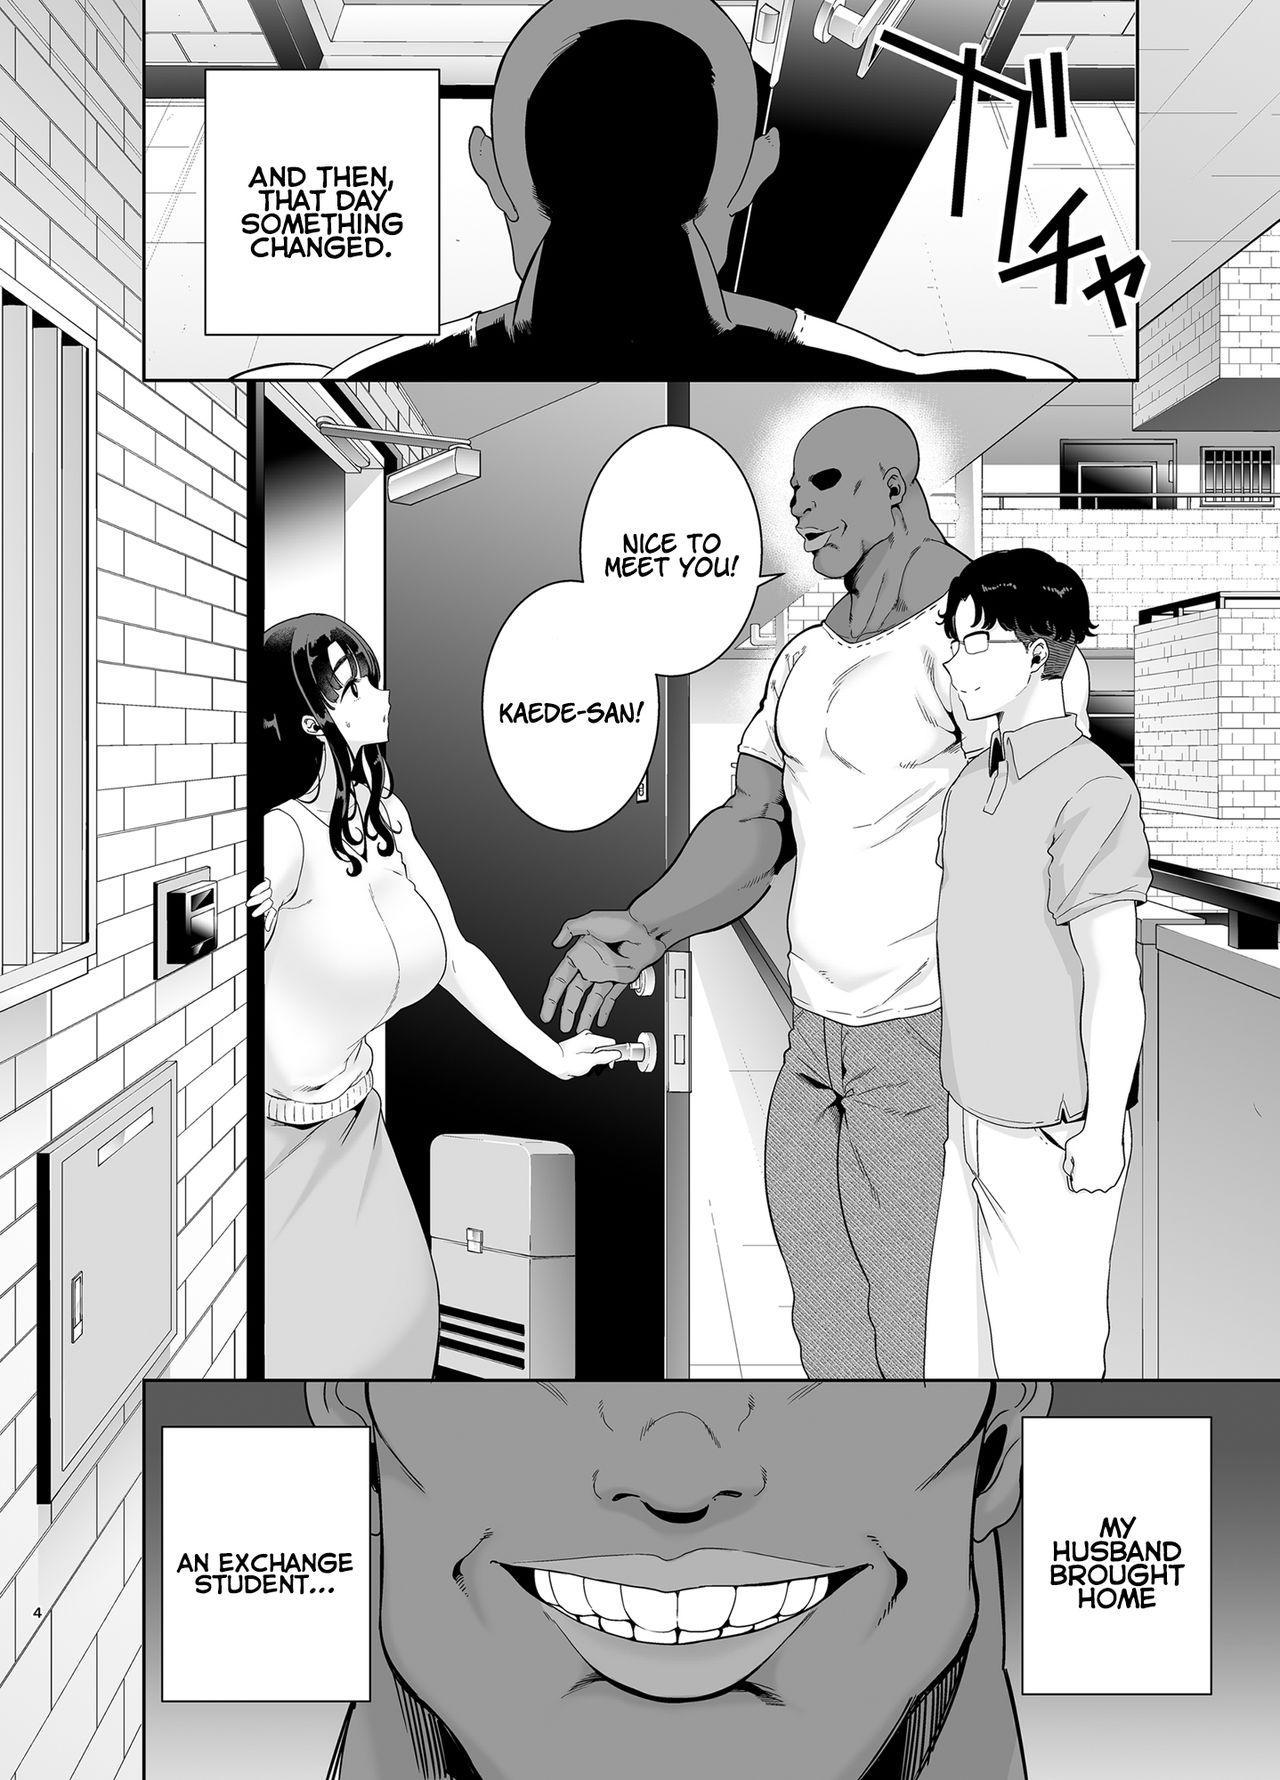 [DOLL PLAY (Kurosu Gatari)] Wild-shiki Nihonjin Tsuma no Netorikata Sono Ichi   Wild Method - How to Steal a Japanese Housewife - Part One [English] [Coffedrug] [Digital] 43